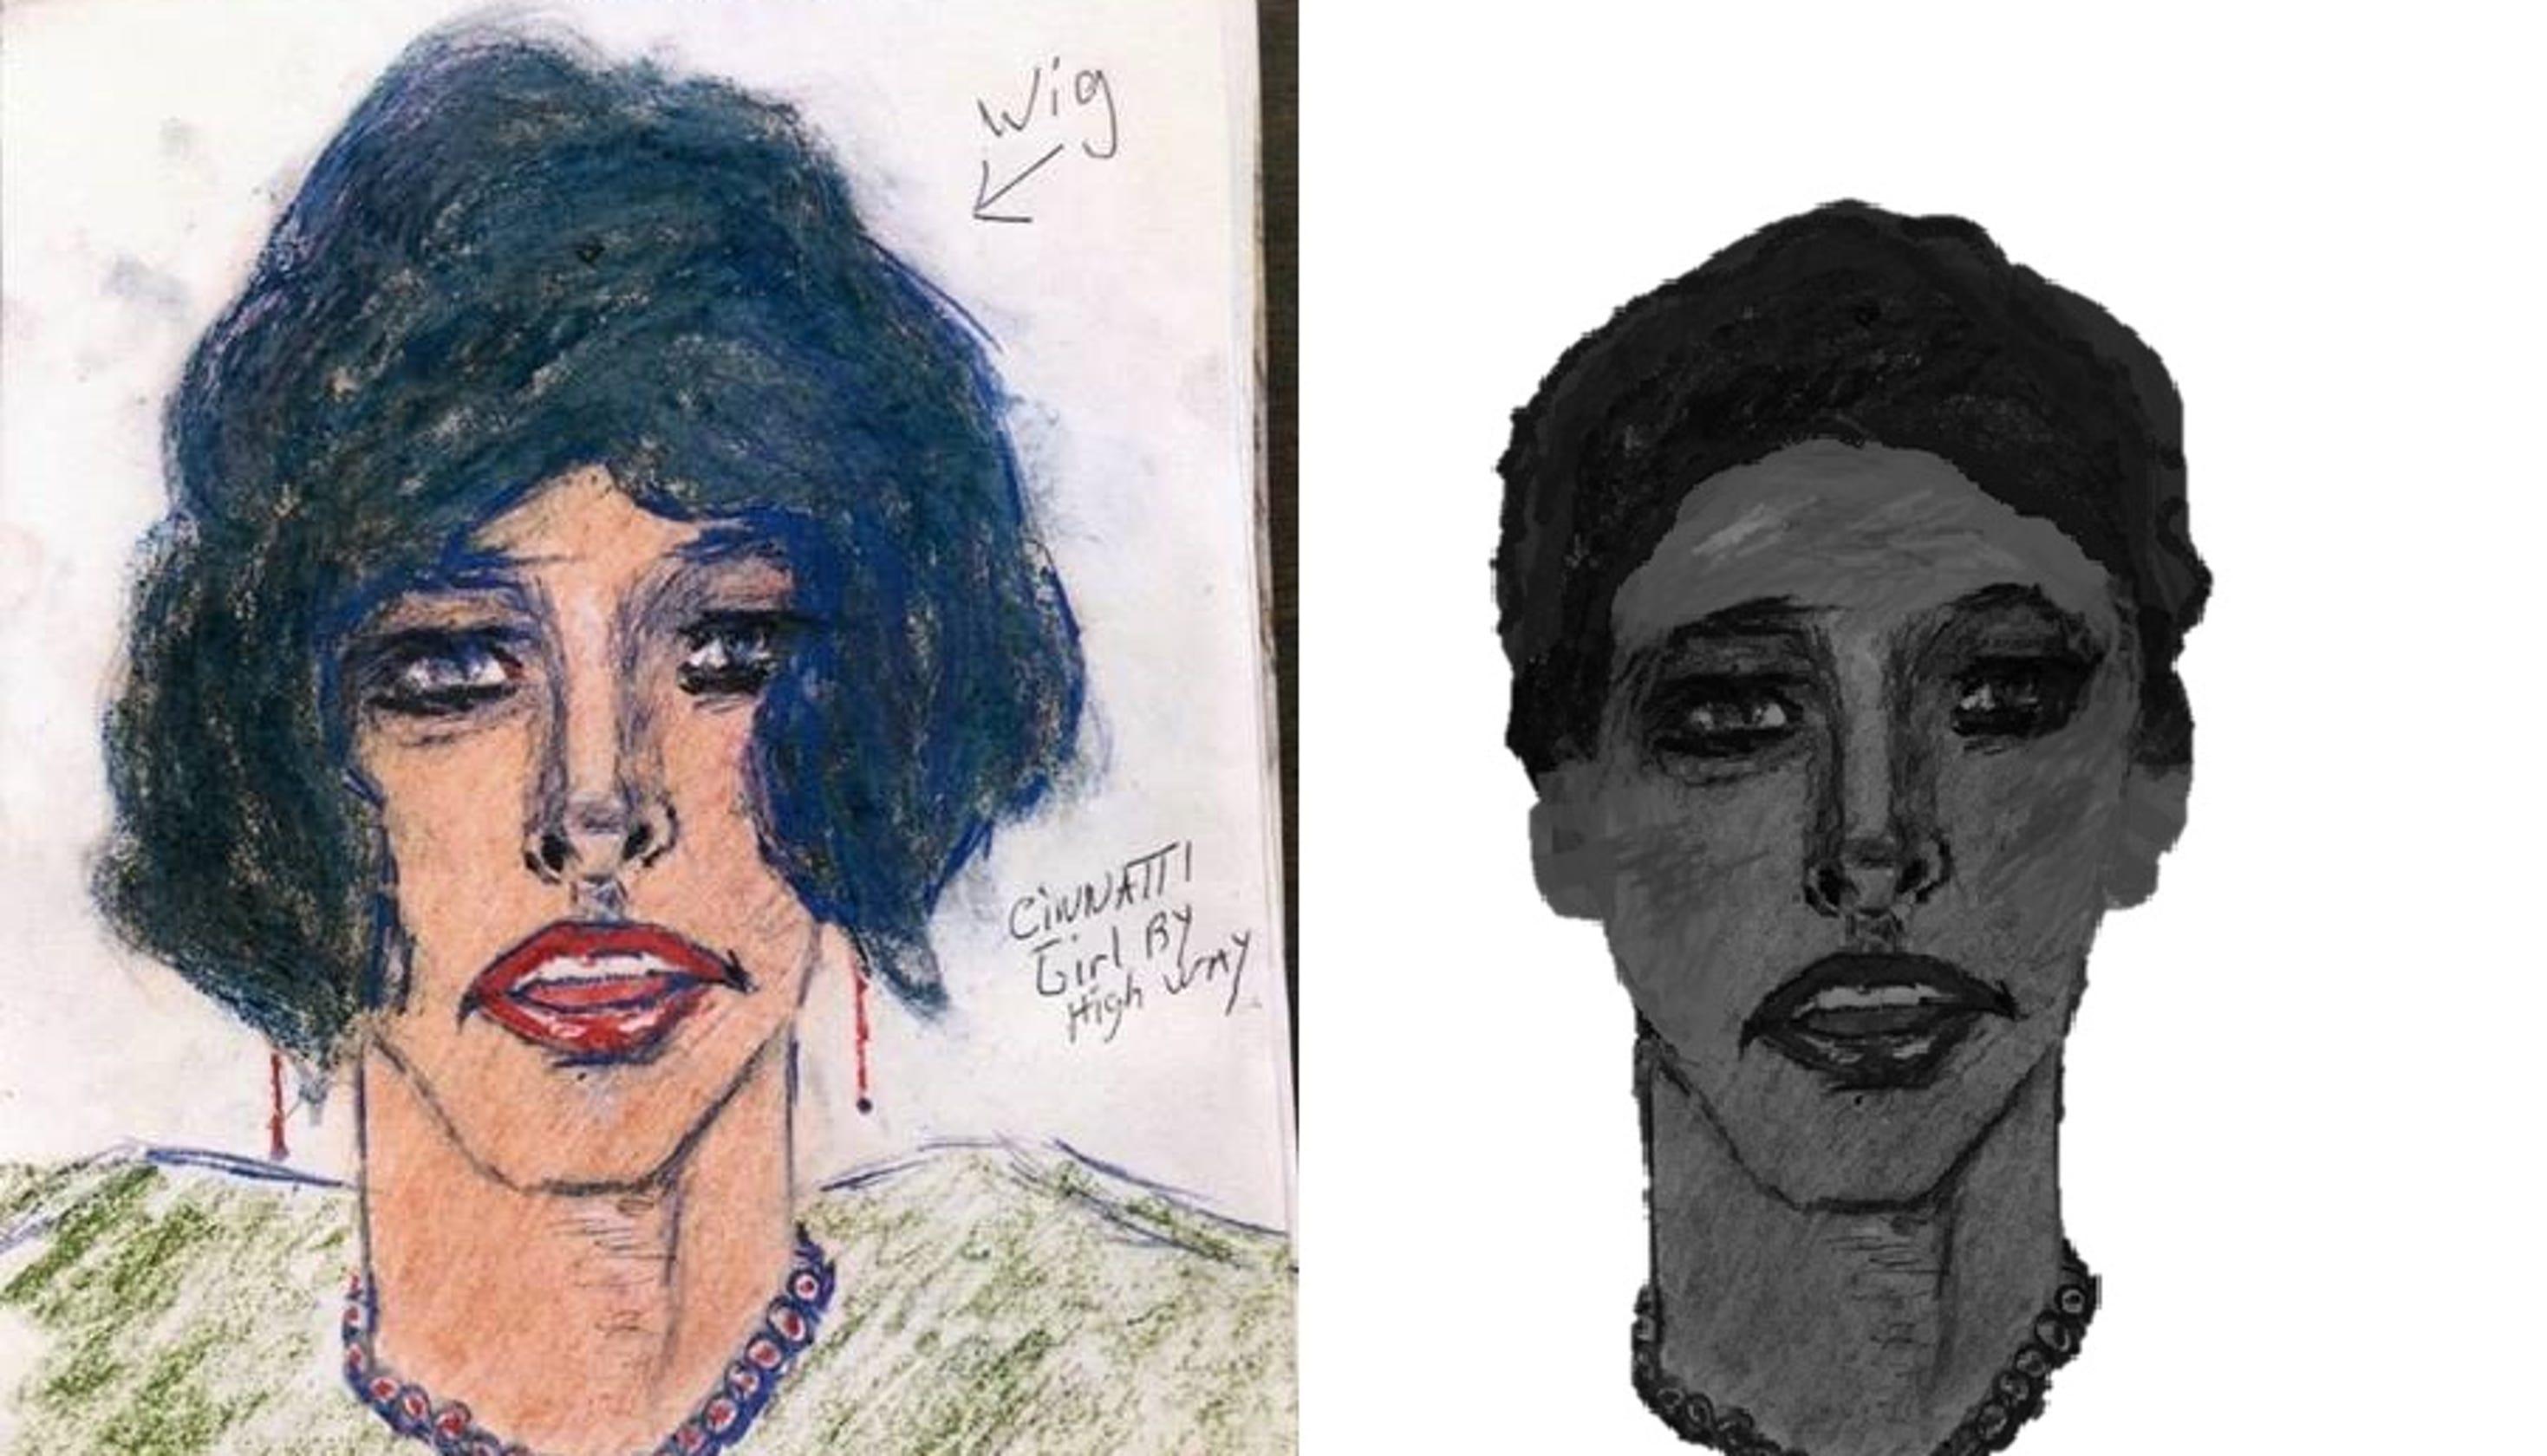 Samuel Little serial killer: Search is on for missing ...